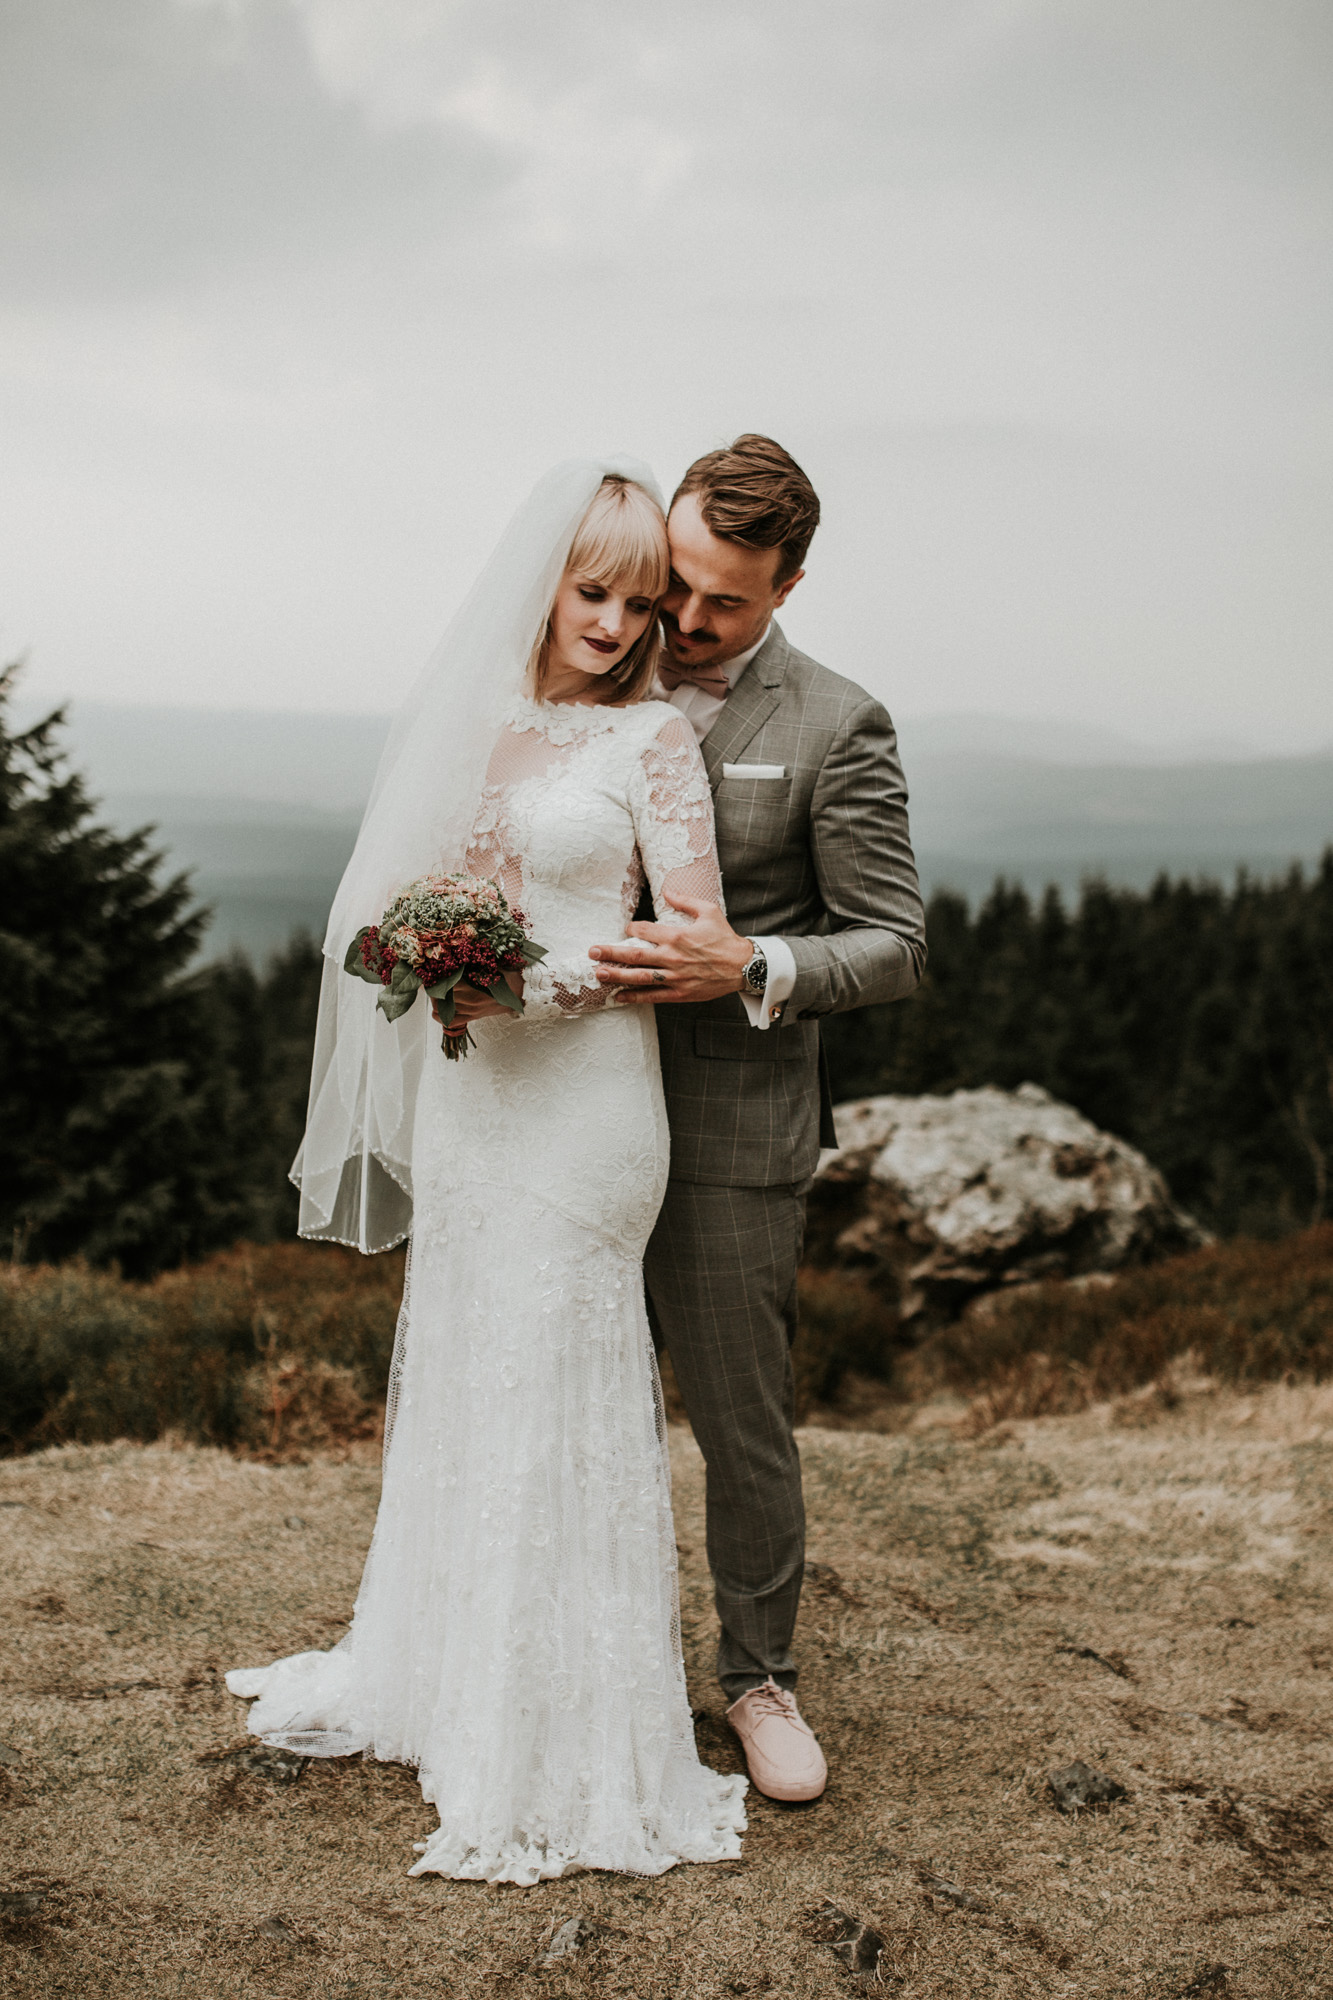 DanielaMarquardtPhotography_Hochzeitsfotograf_Düsseldorf_Köln_Mallorca_Bayern_Austria_Harz_LinaundMaik_Afterwedding-Shooting_Weddingphotographer_Ibiza_Tuskany_Italien_Toskana86